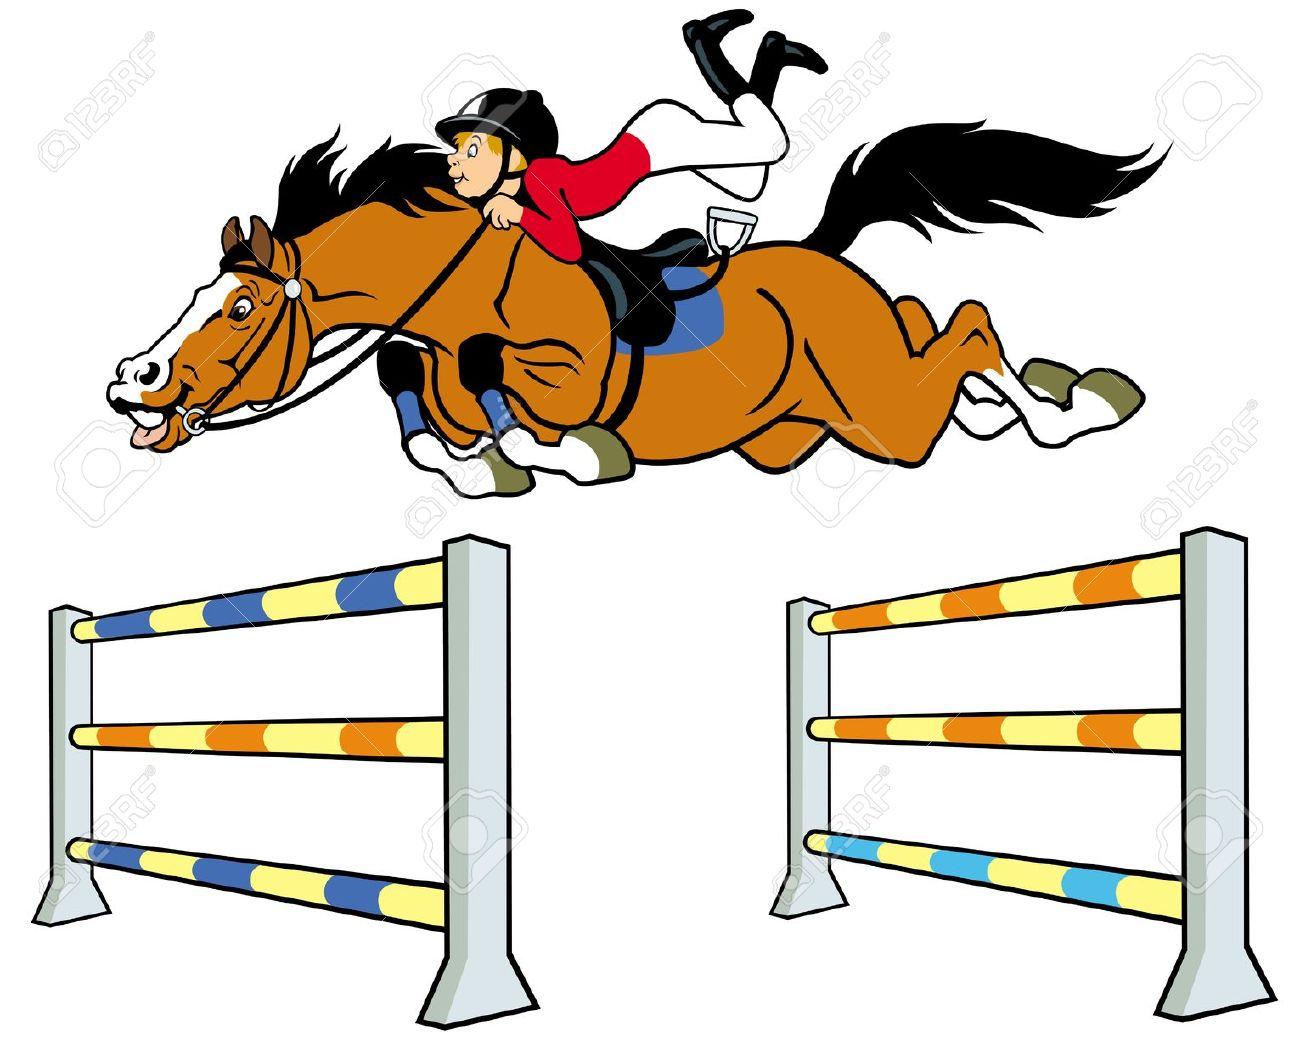 Equestrian Sport,boy With Horse Jumping A Hurdle,cartoon.